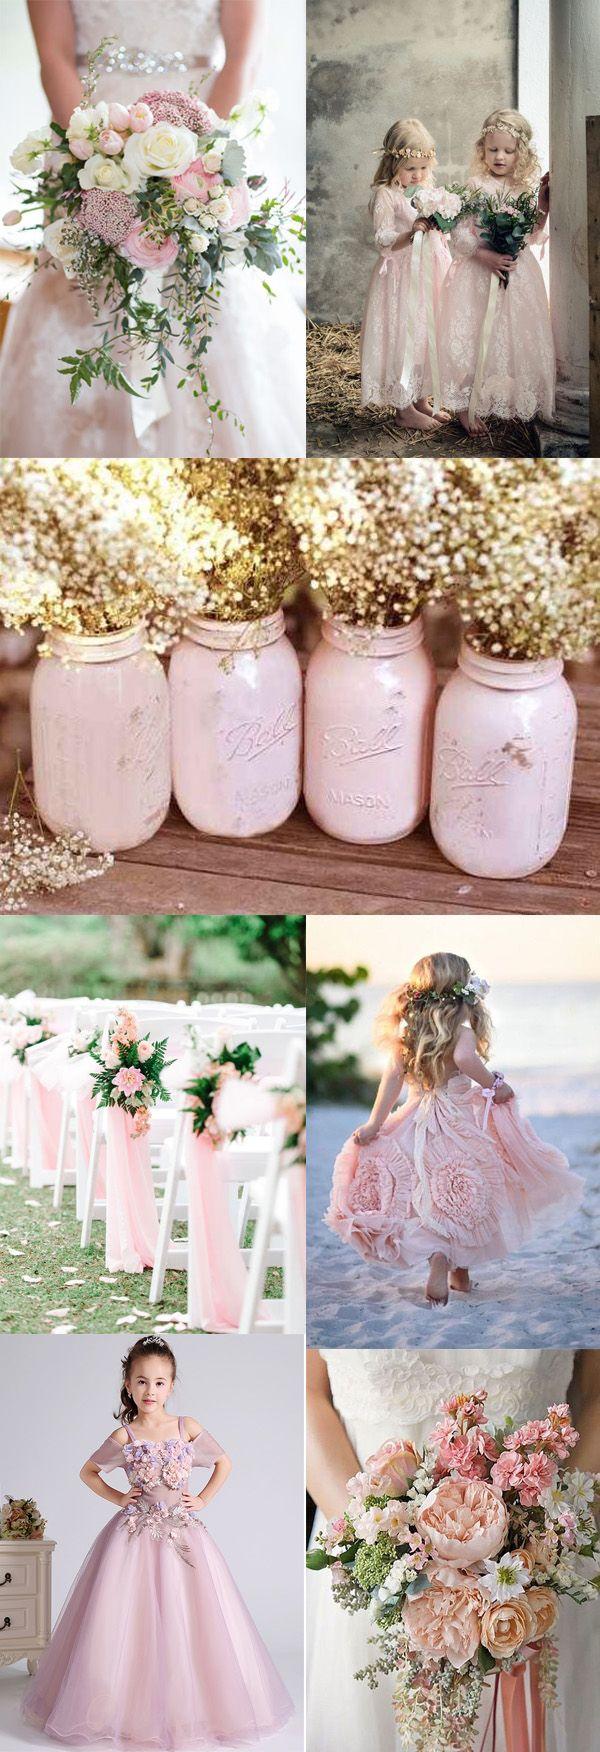 Material:Tulle Embellishments:Flowers  #flowergirl #dress #wedding #weddingdress #pink #weddingbouquet